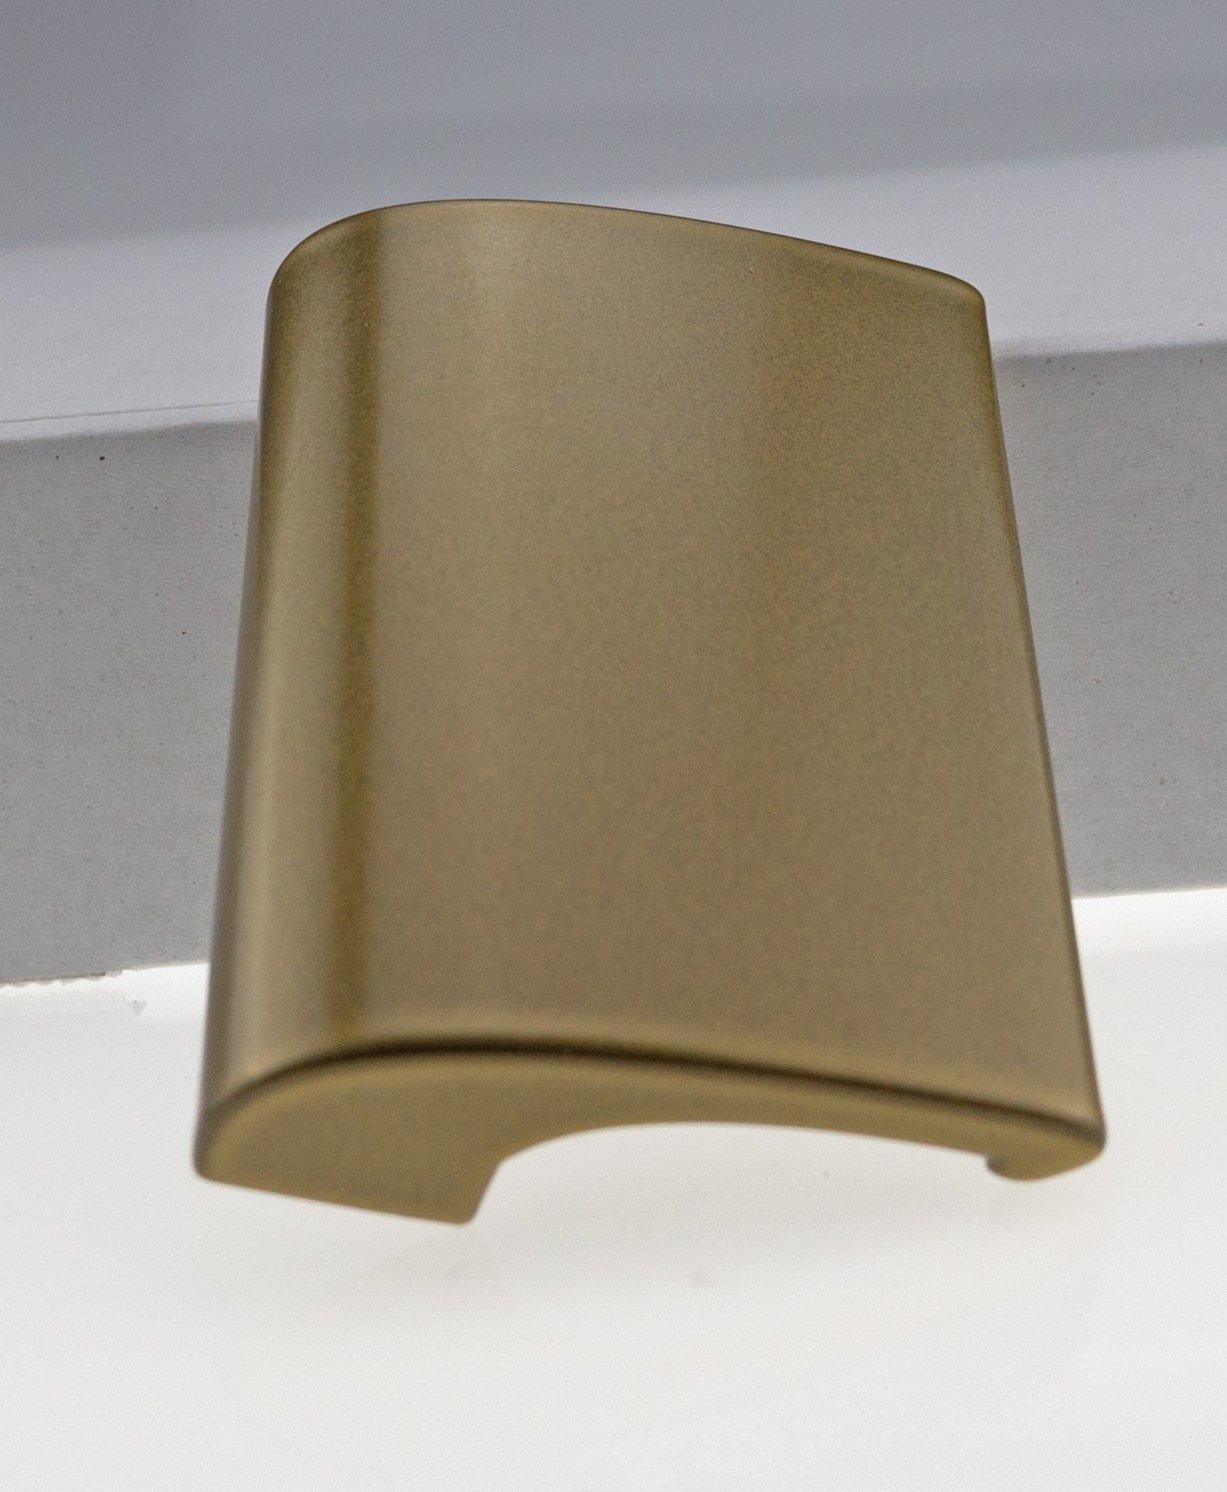 Balkongriff Ziehgriff Terrassentürgriff Deluxe - Aluminium - verschiedene Farbe (braun) BLT